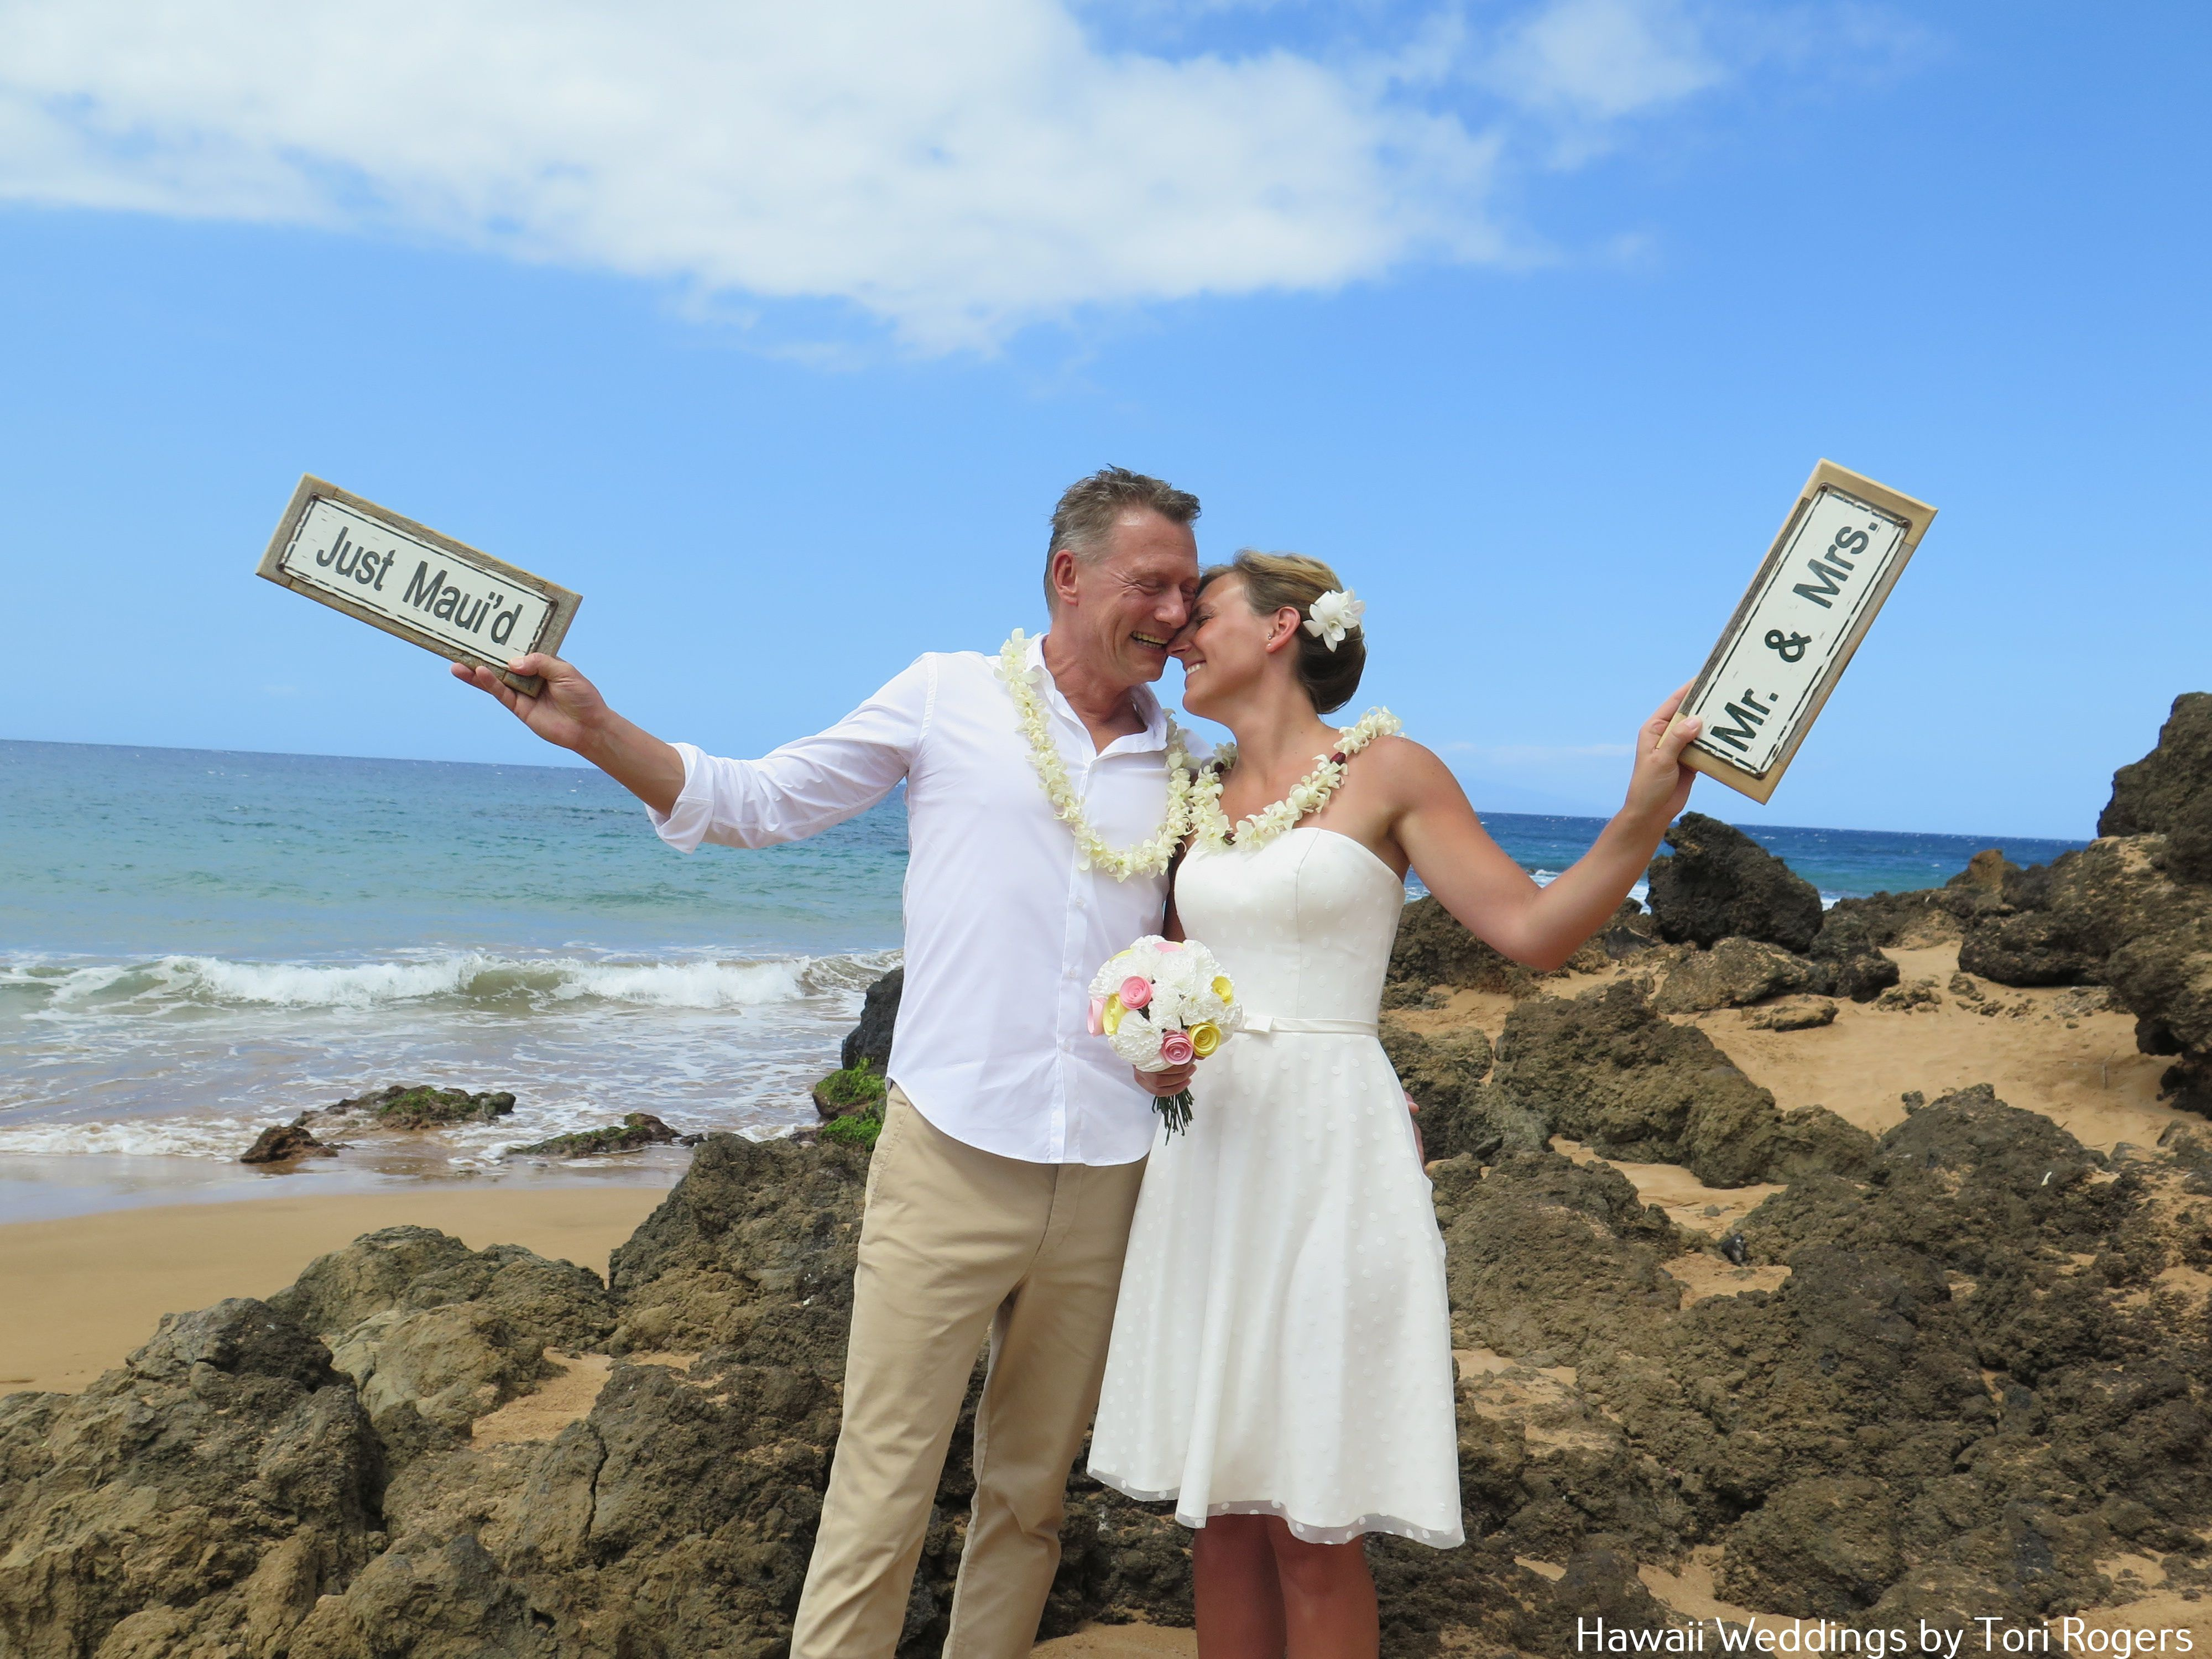 Just mauid hawaii weddings by tori rogers wwwhawaiianweddings just mauid hawaii weddings by tori rogers wwwhawaiianweddings junglespirit Choice Image